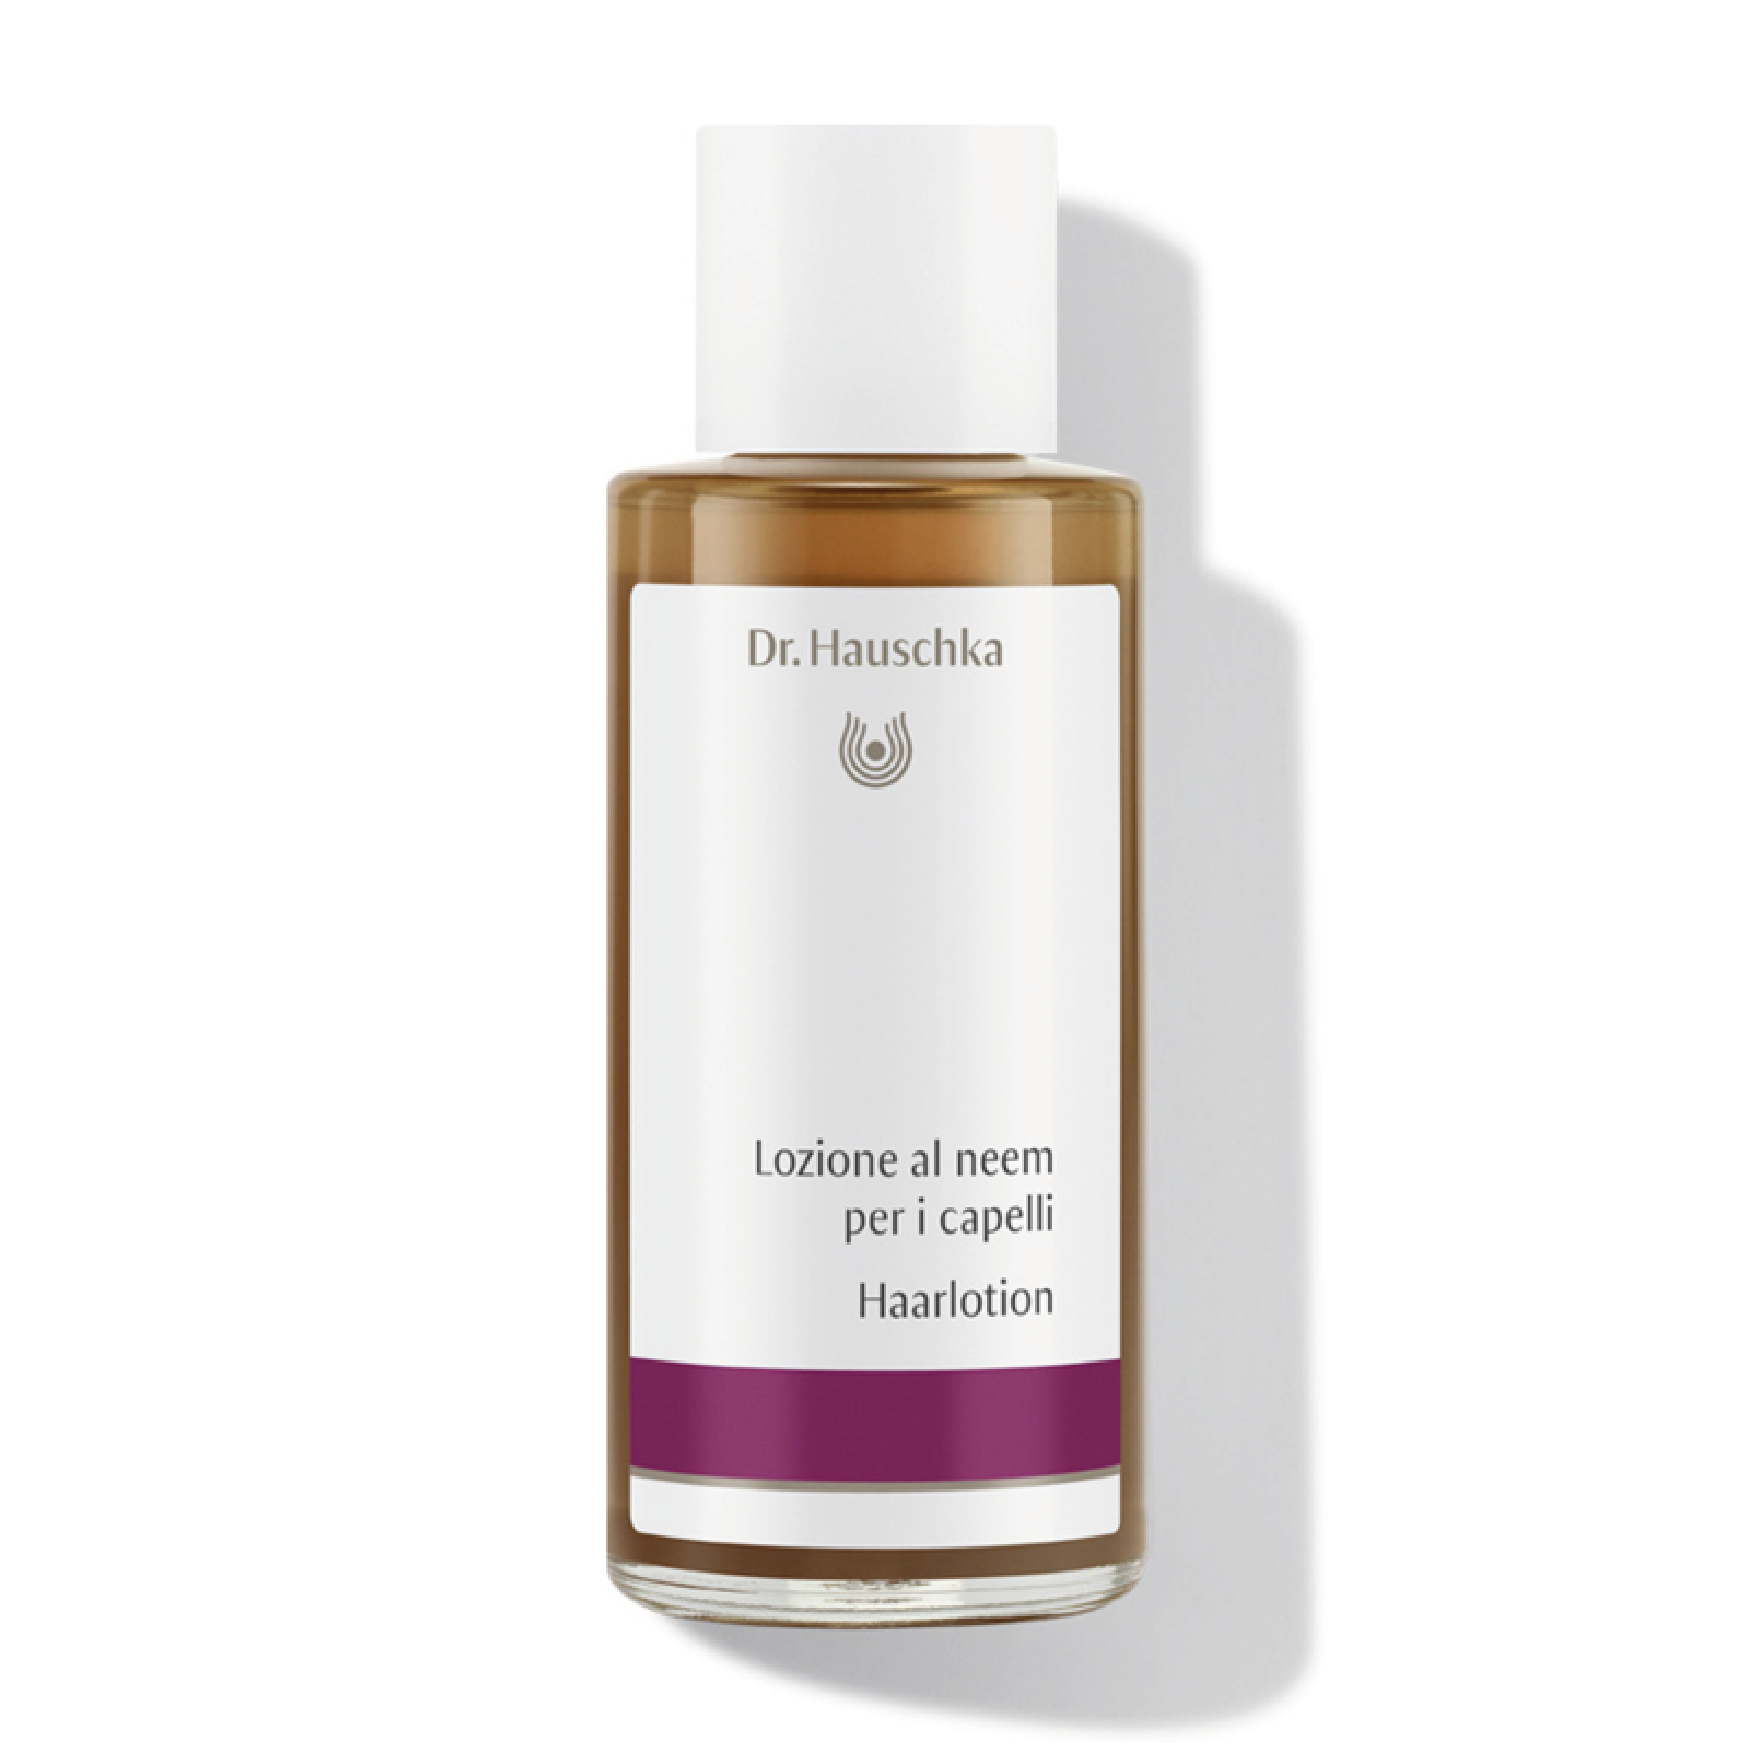 Haarlotion 100ml – DR. HAUSCHKA